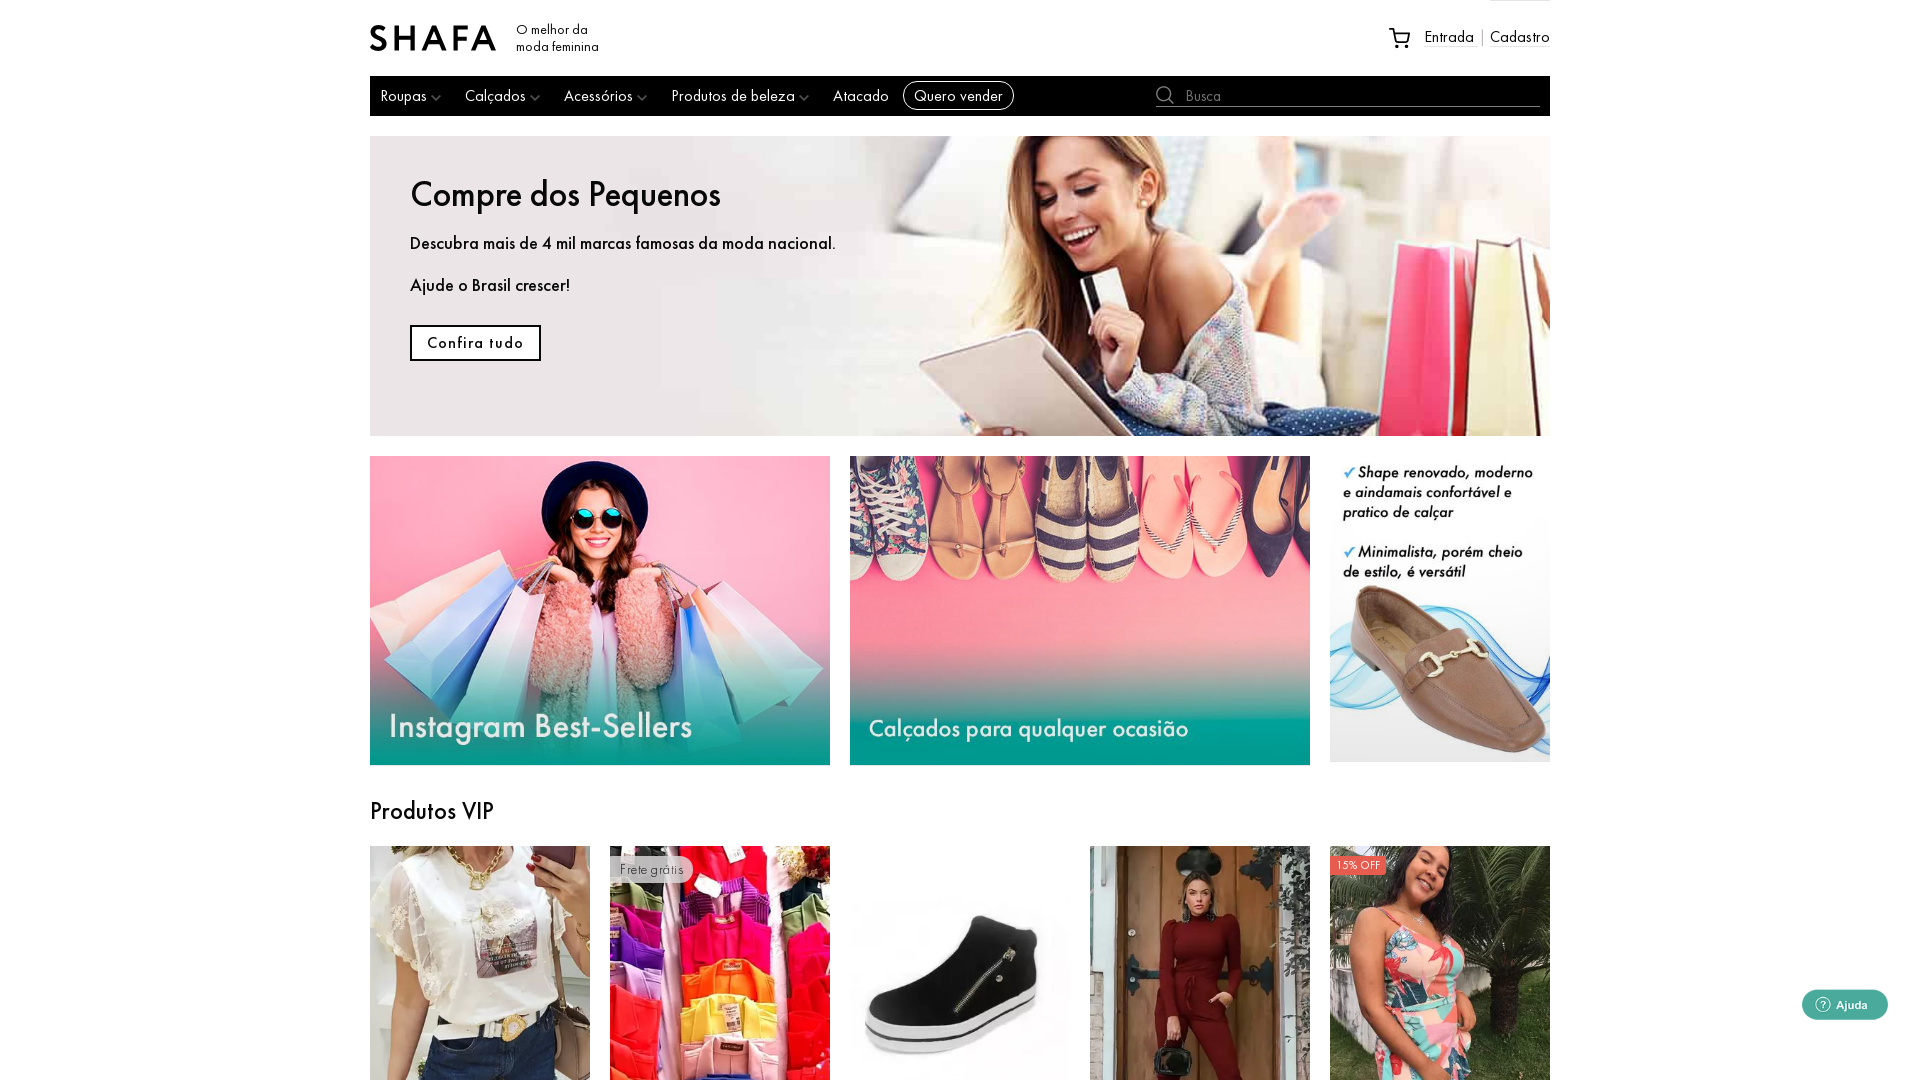 Shafa website